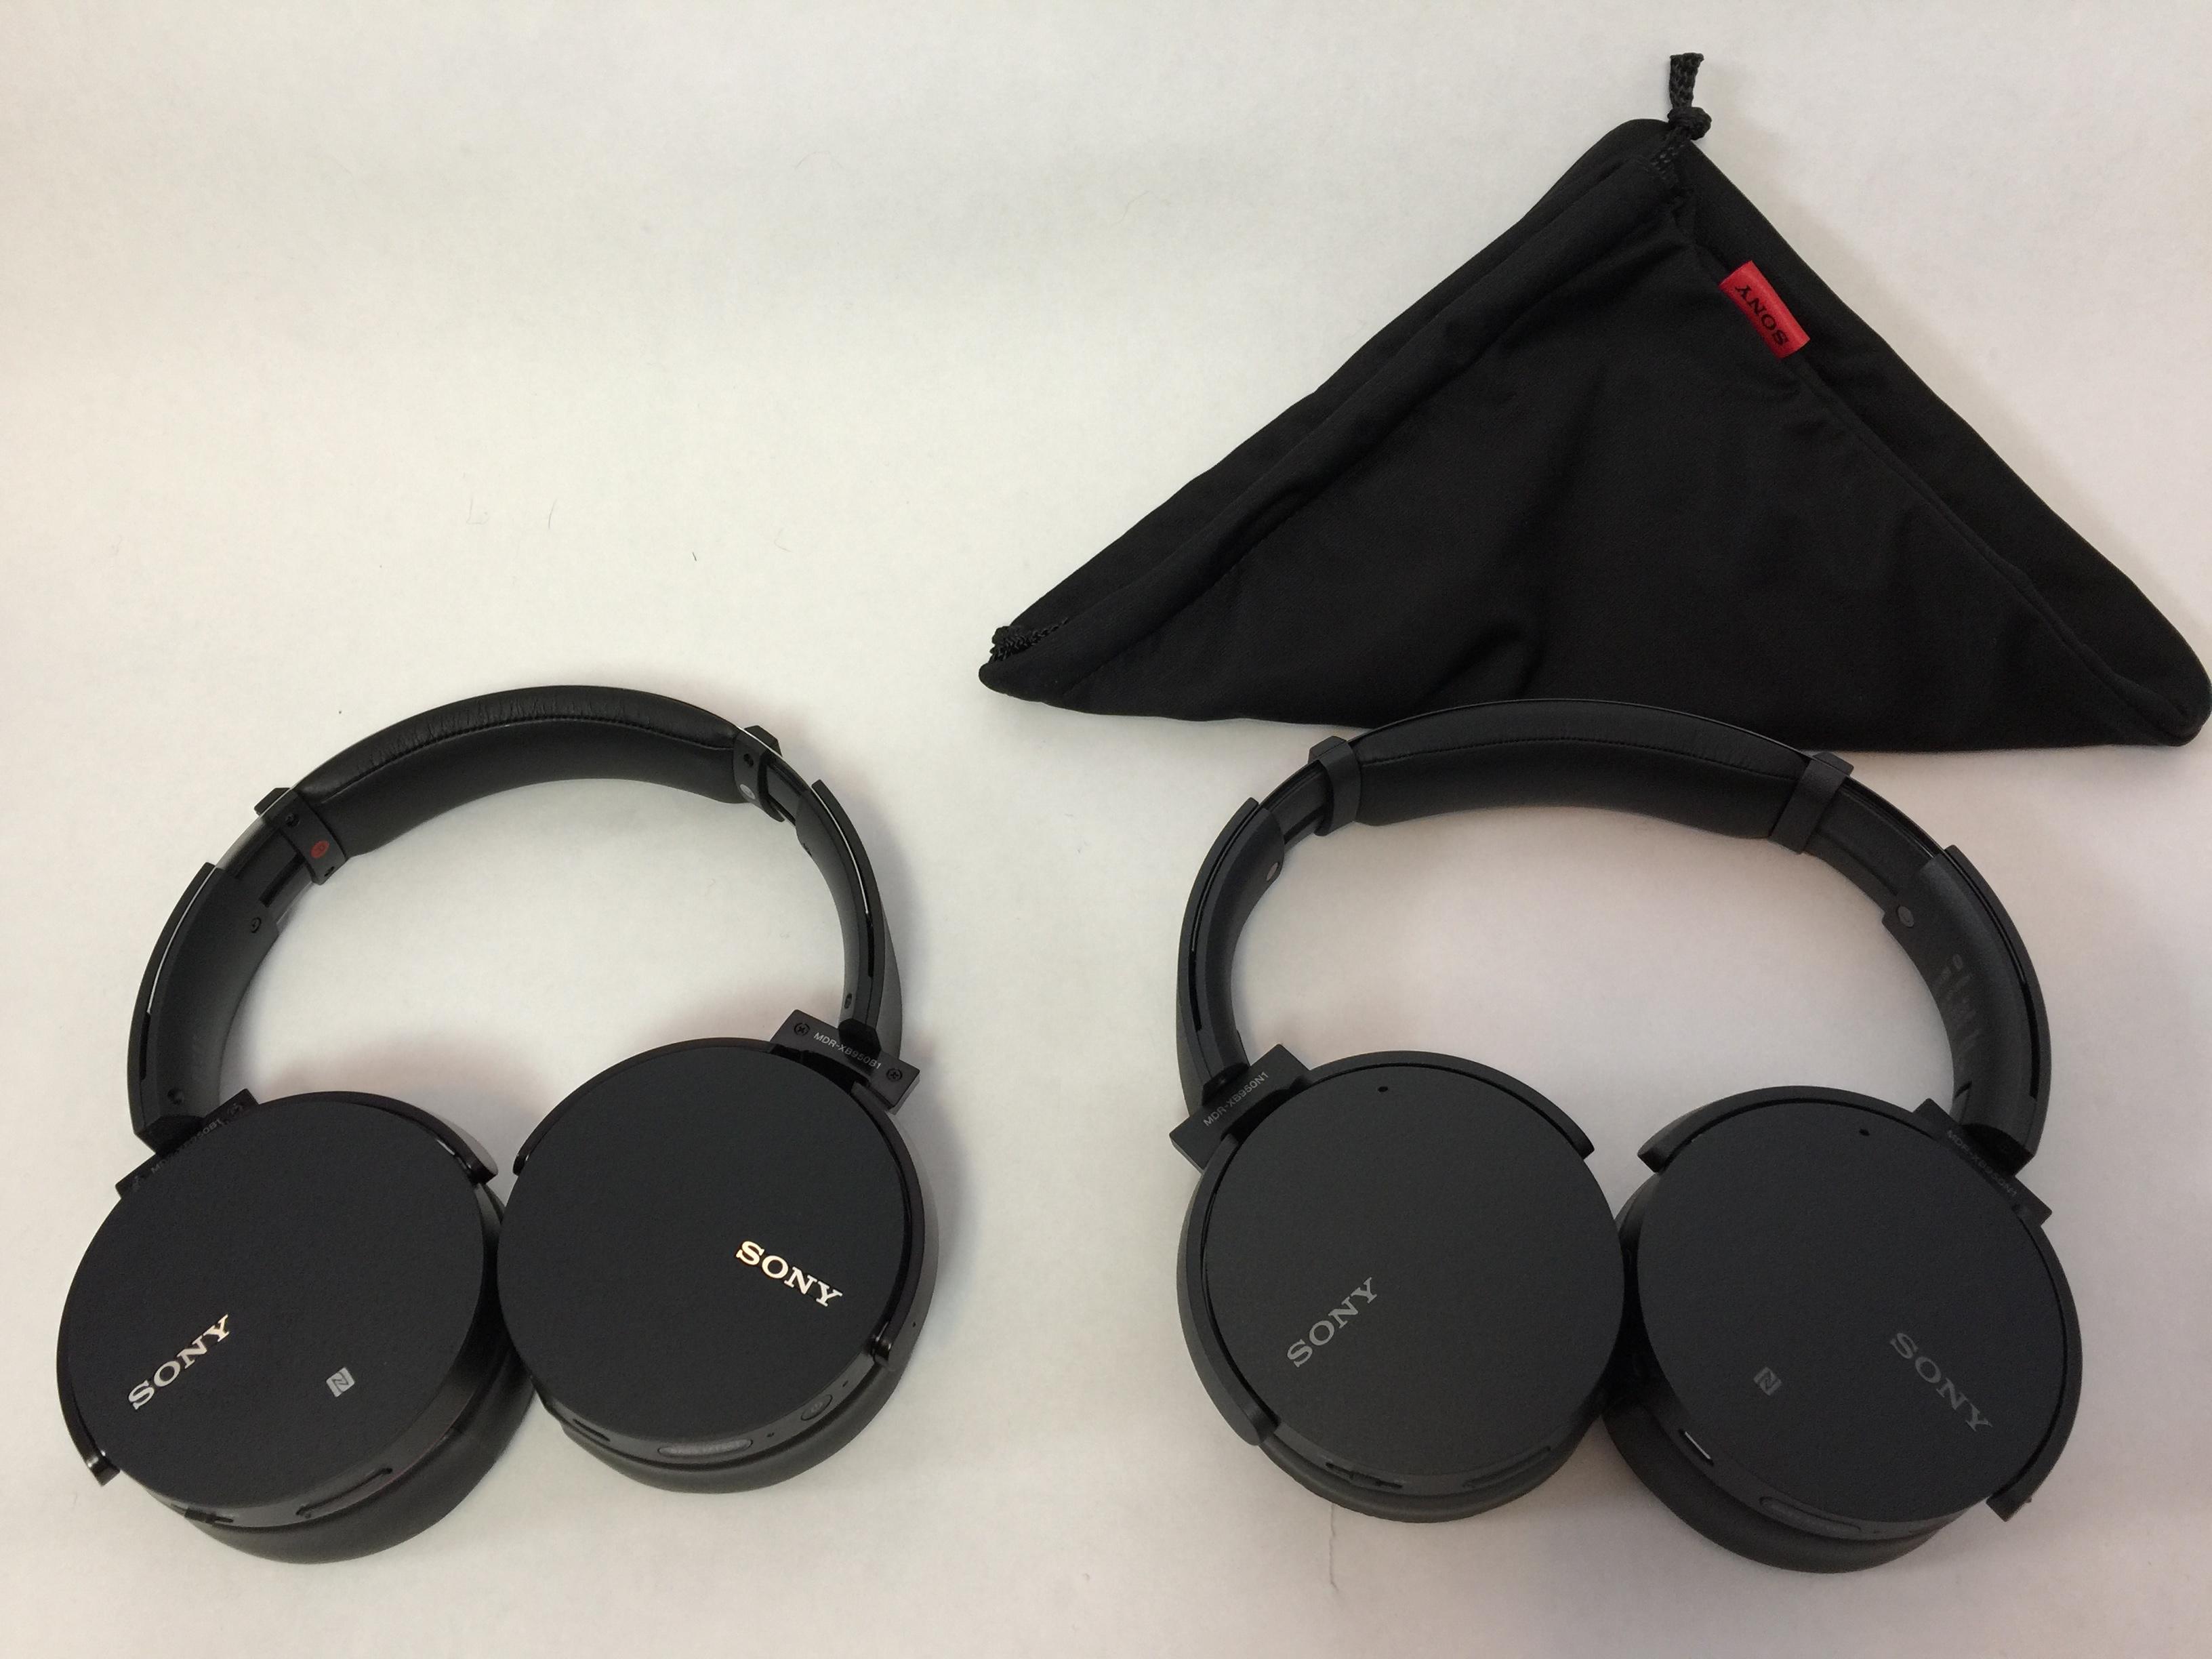 sony mdr duo headphones